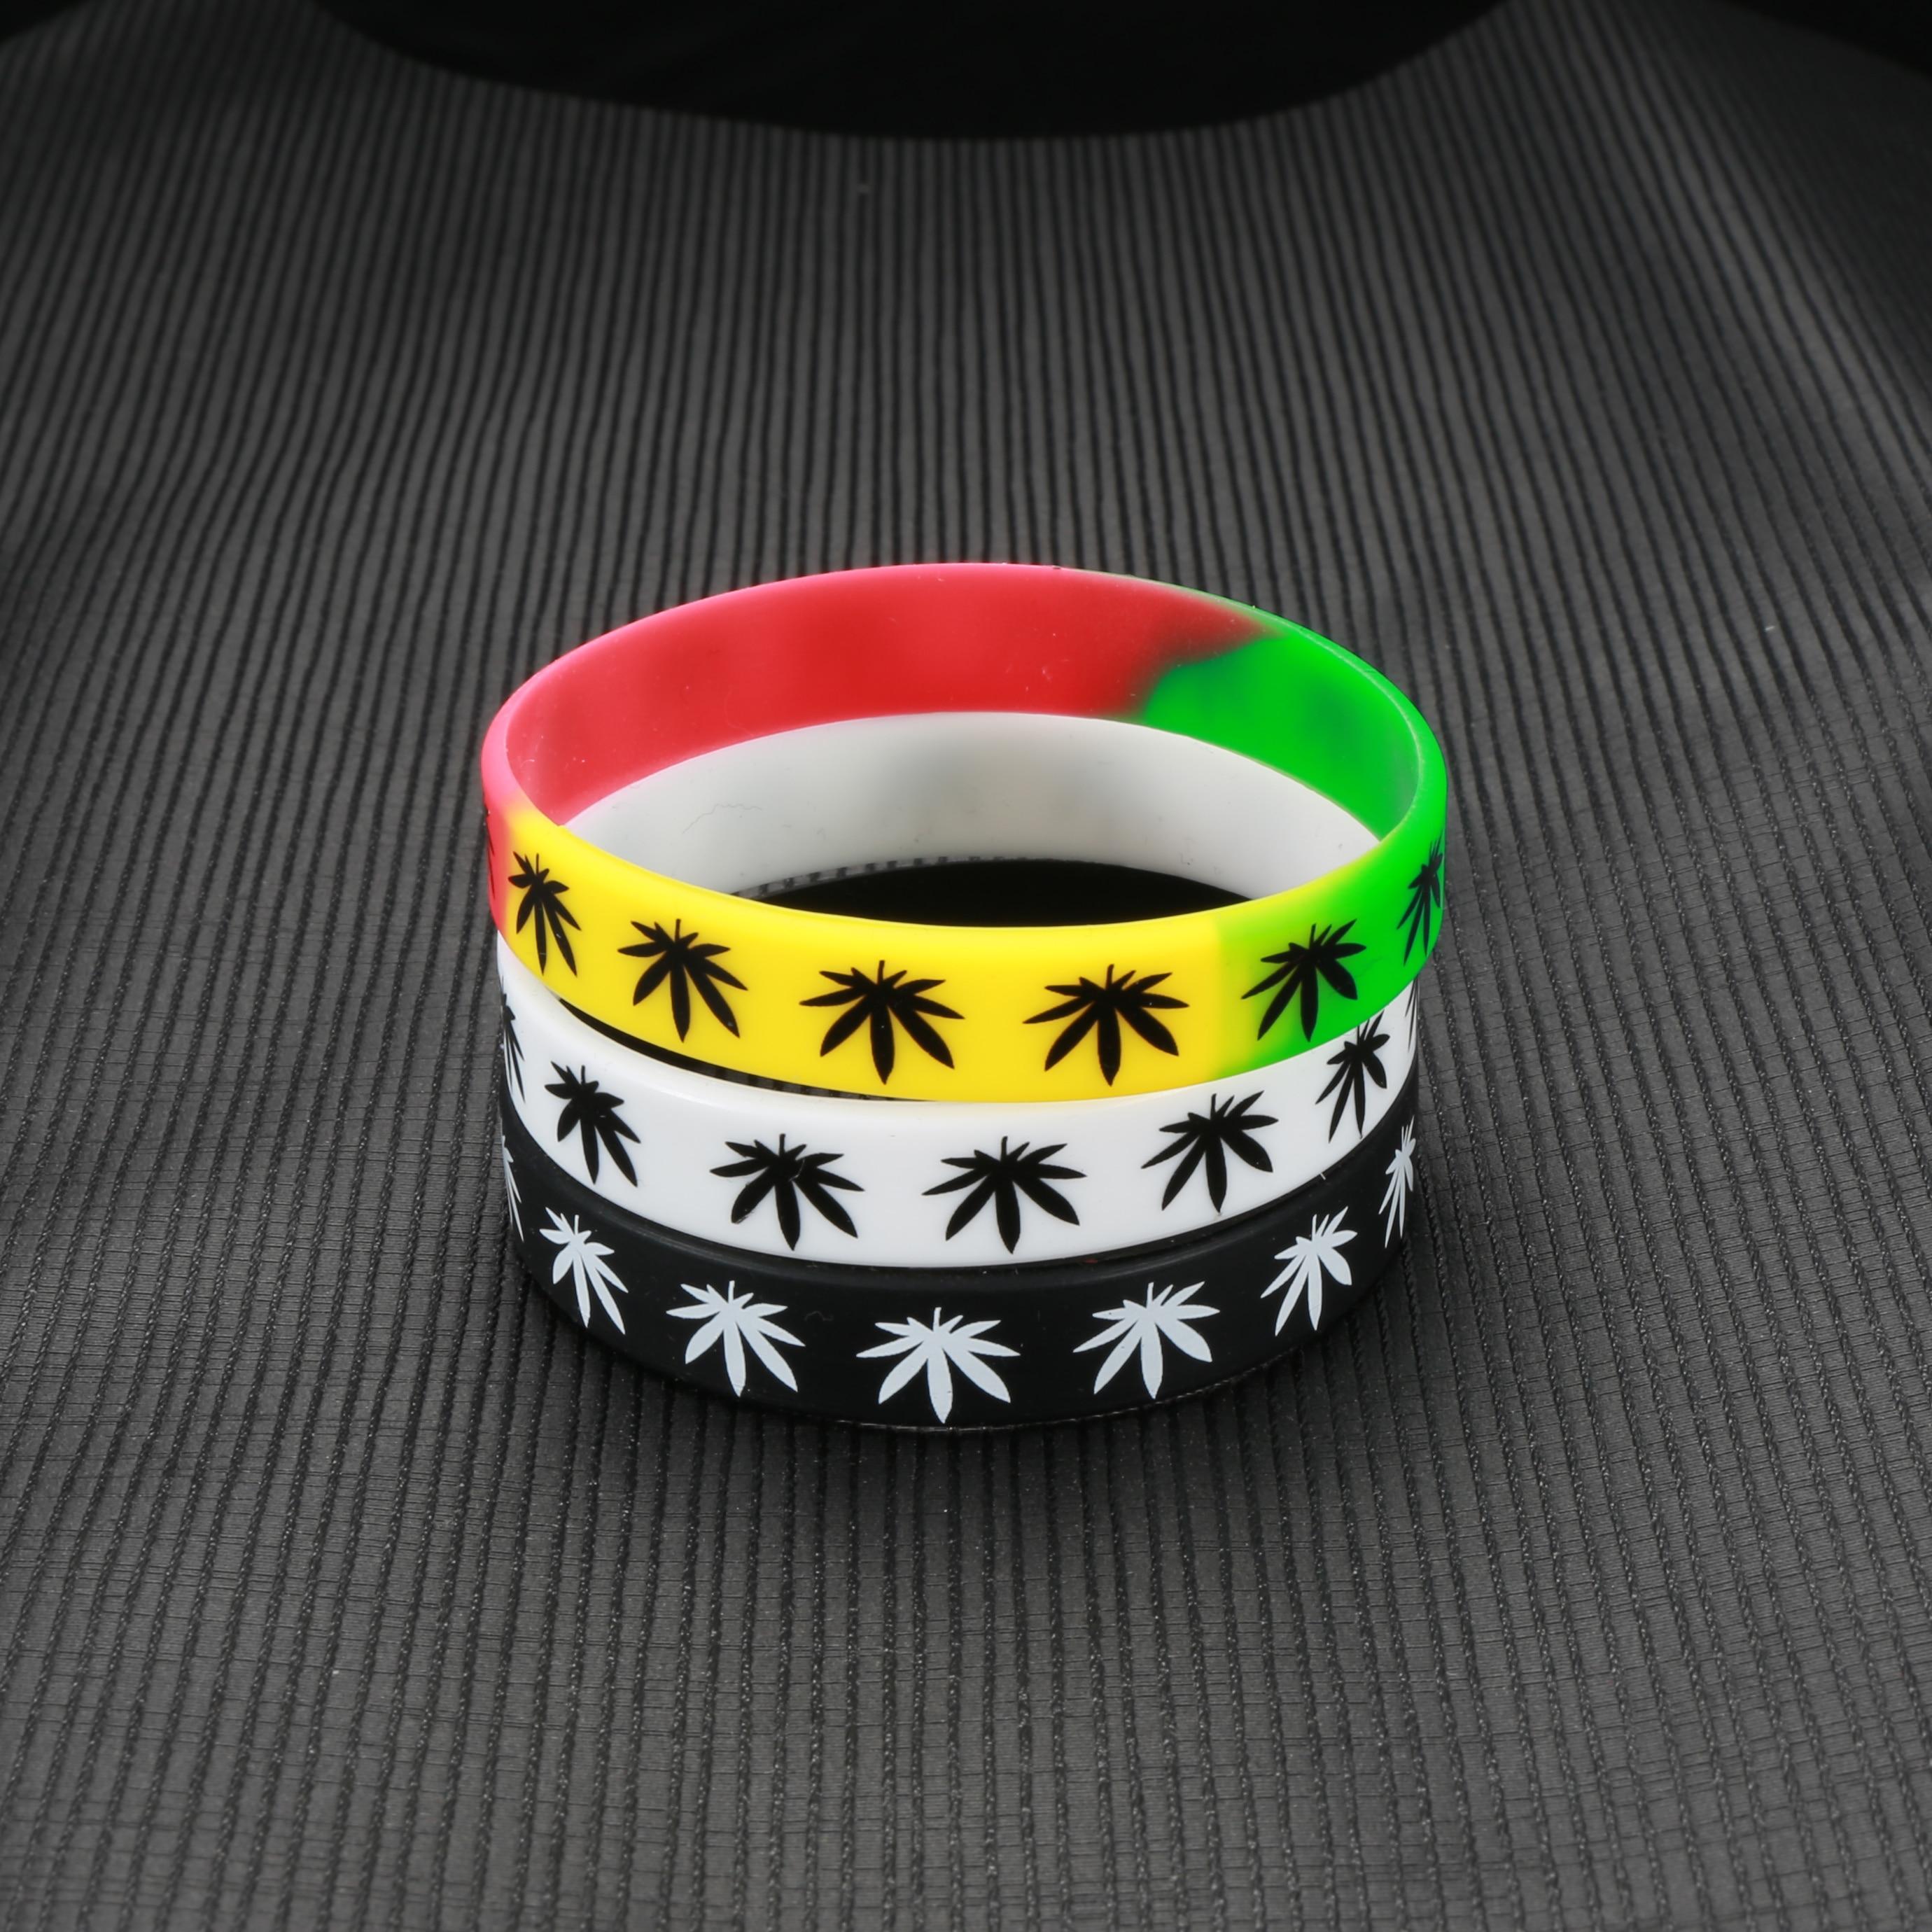 Reggae Marijuana Leaf Pot Charm Bracelet Bangle Rasta Weed